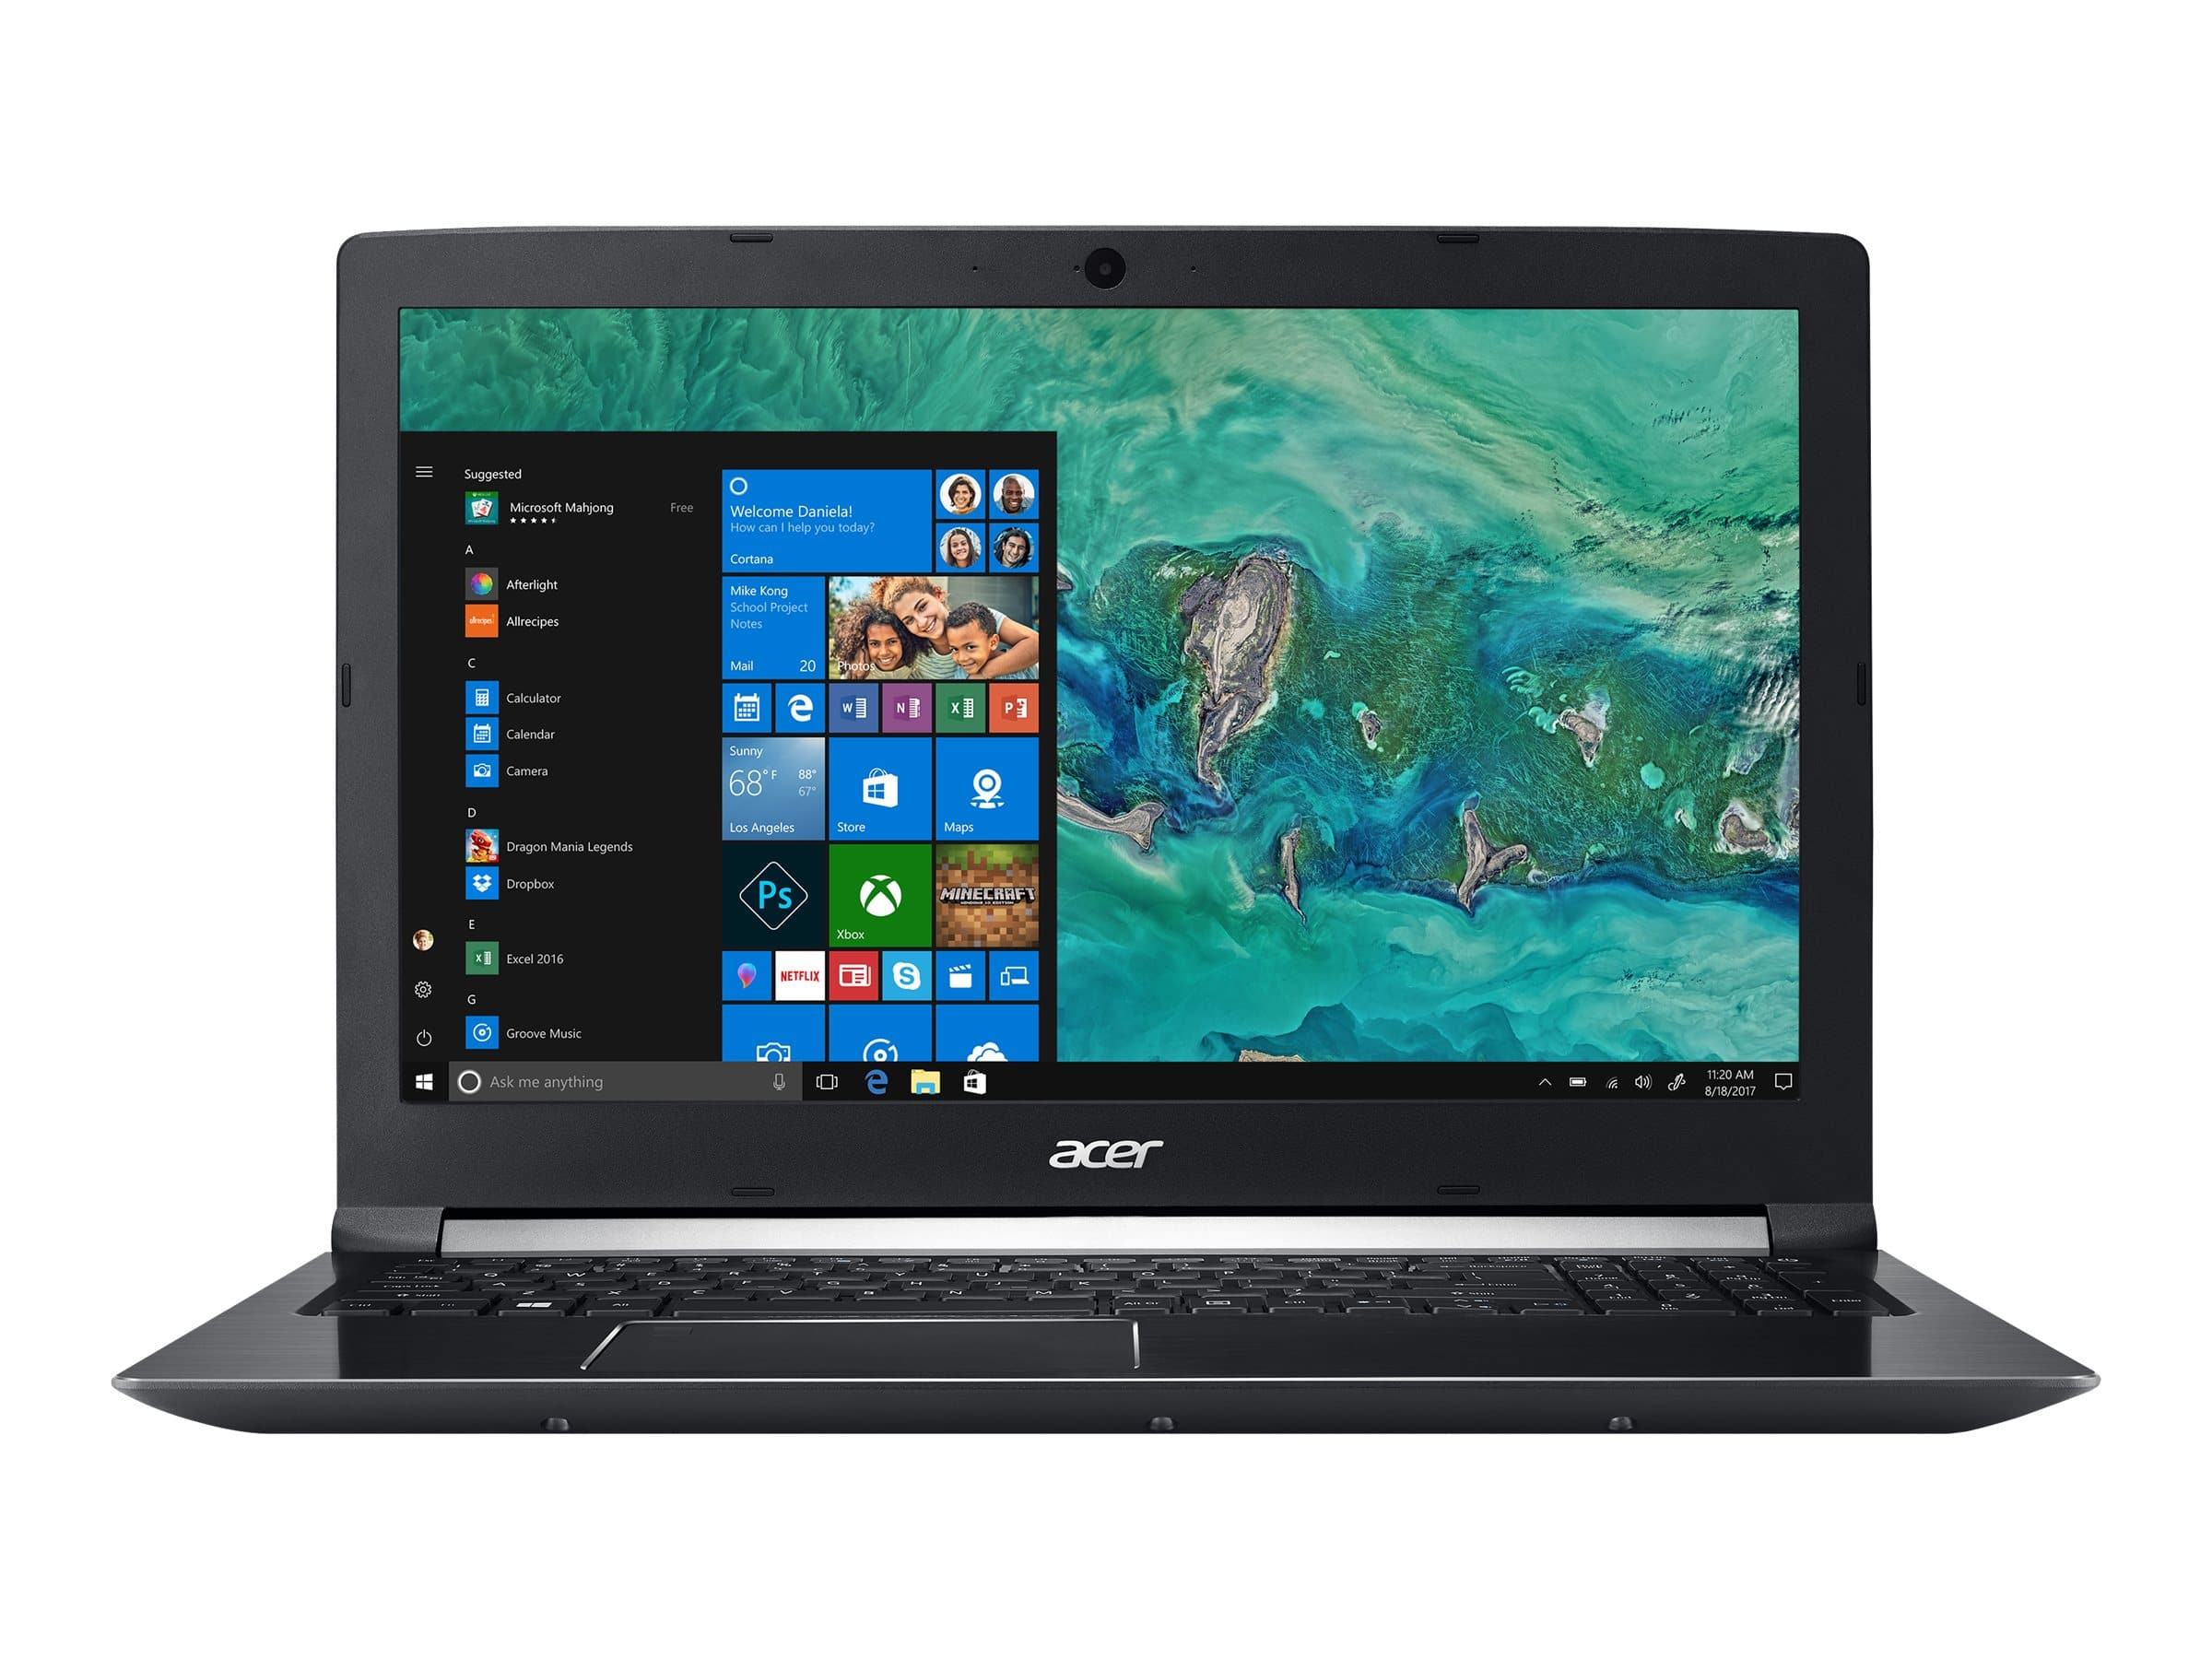 "Acer Aspire 7 A715-72G-79BH, 15.6"" Full HD, 8th Gen Intel Core i7-8750H, NVIDIA GeForce GTX 1050, 8GB DDR4, 1TB HDD, HDMI 2.0, Fingerprint Reader, Windows Hello $599"